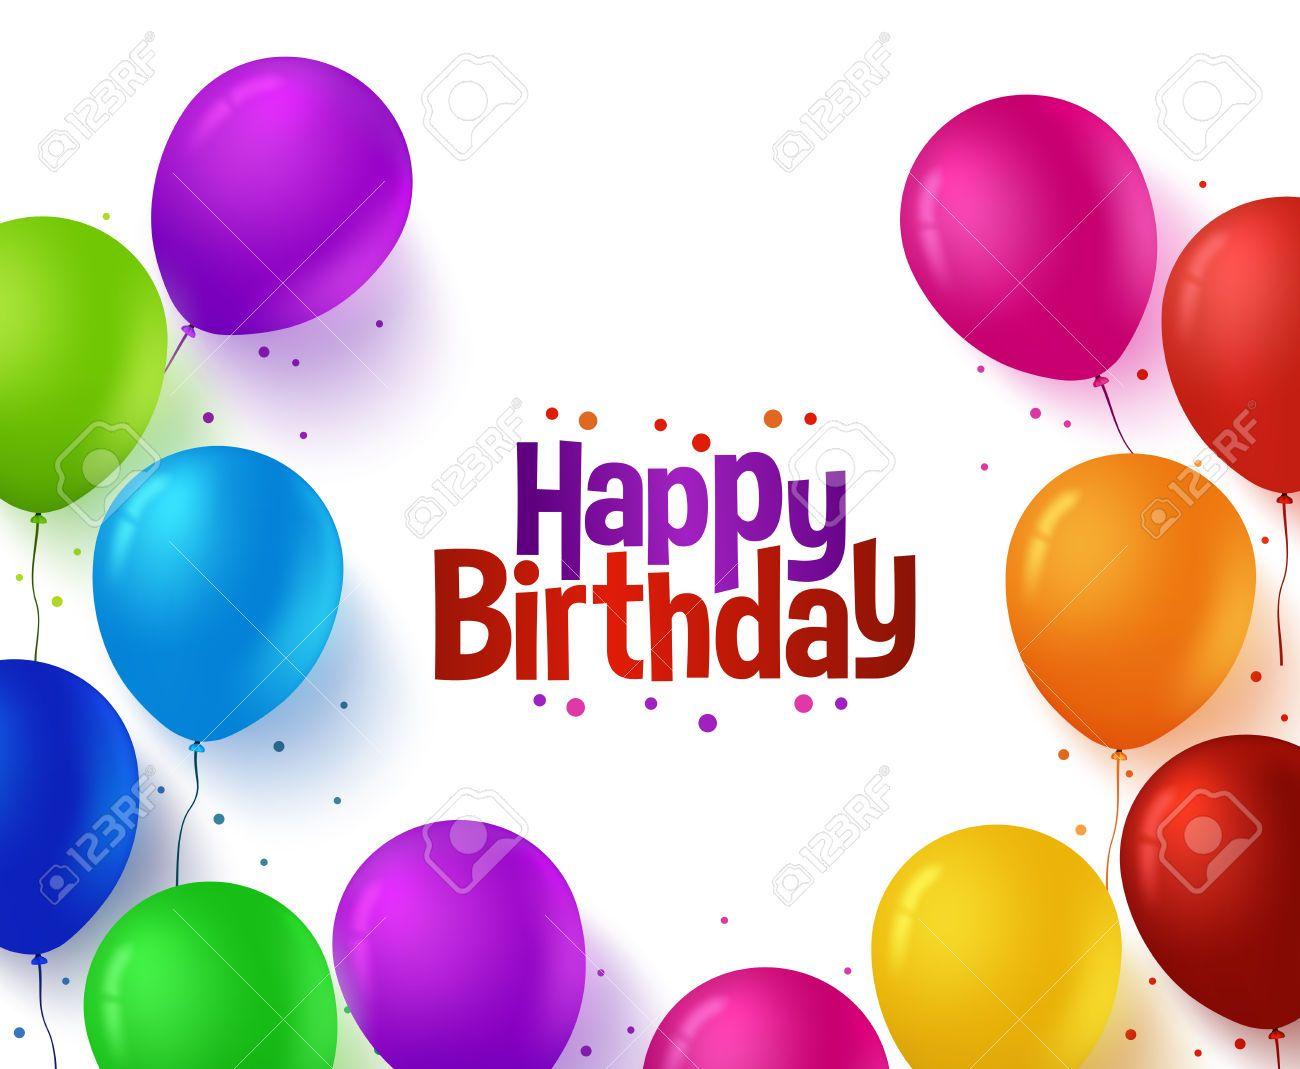 Happy birthday hd 3d google search happy birthday - Happy birthday balloon images hd ...